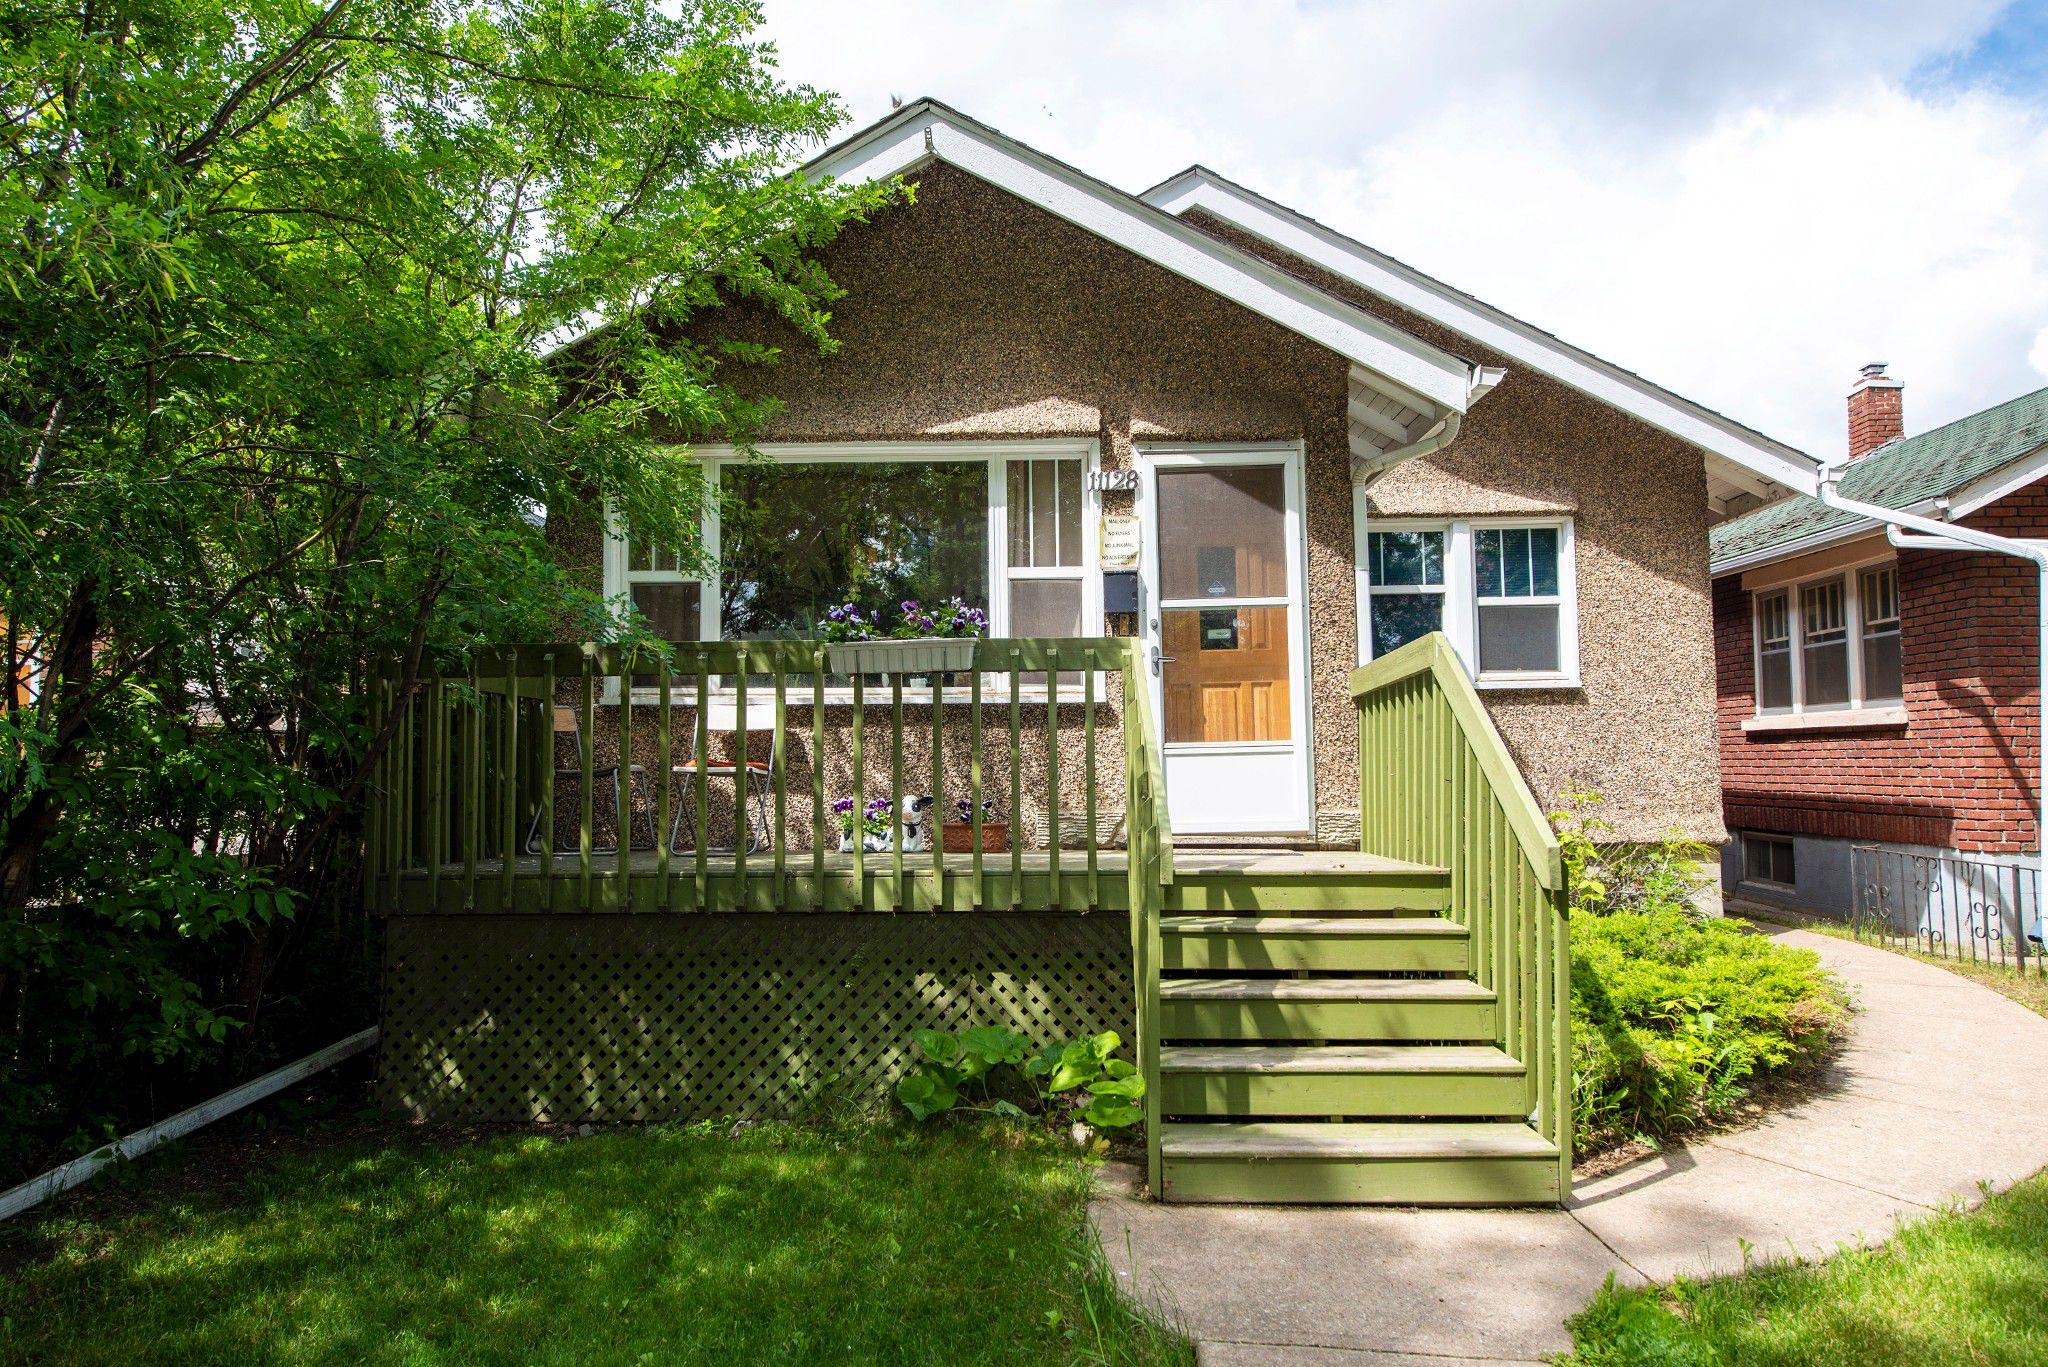 Main Photo: 11128 97 Street in Edmonton: Zone 08 House for sale : MLS®# E4162304